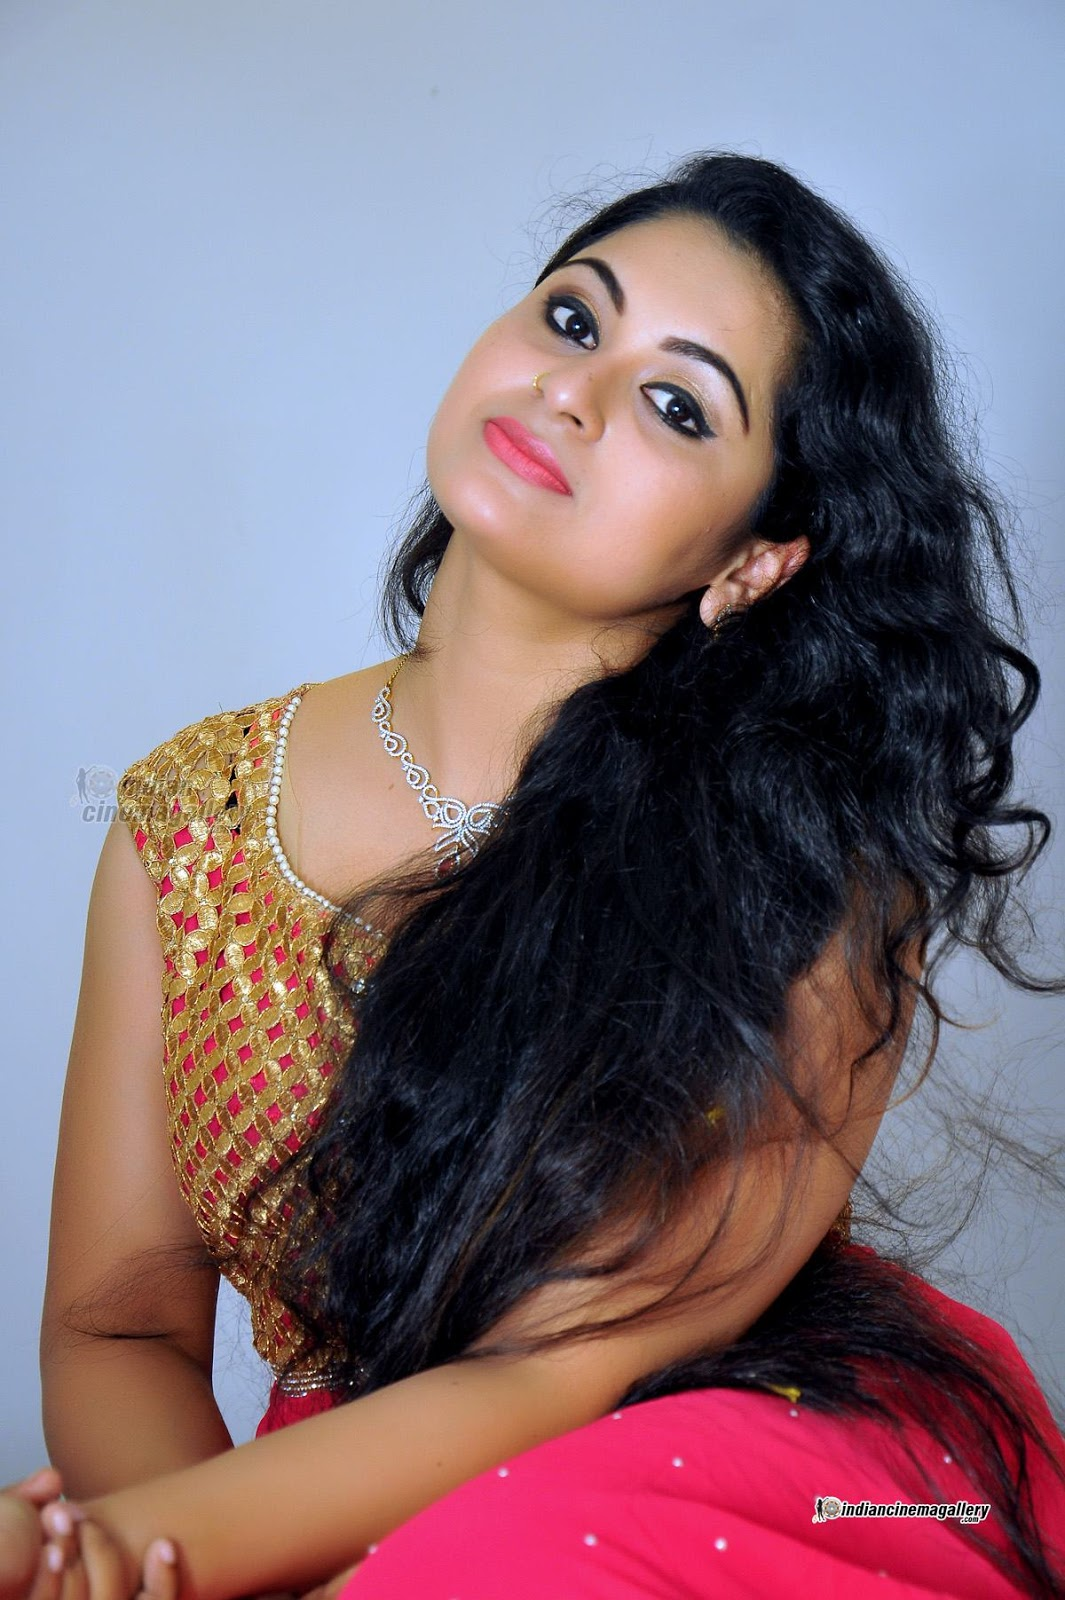 Malayalam Actress Navel Kiss  Holidays Oo